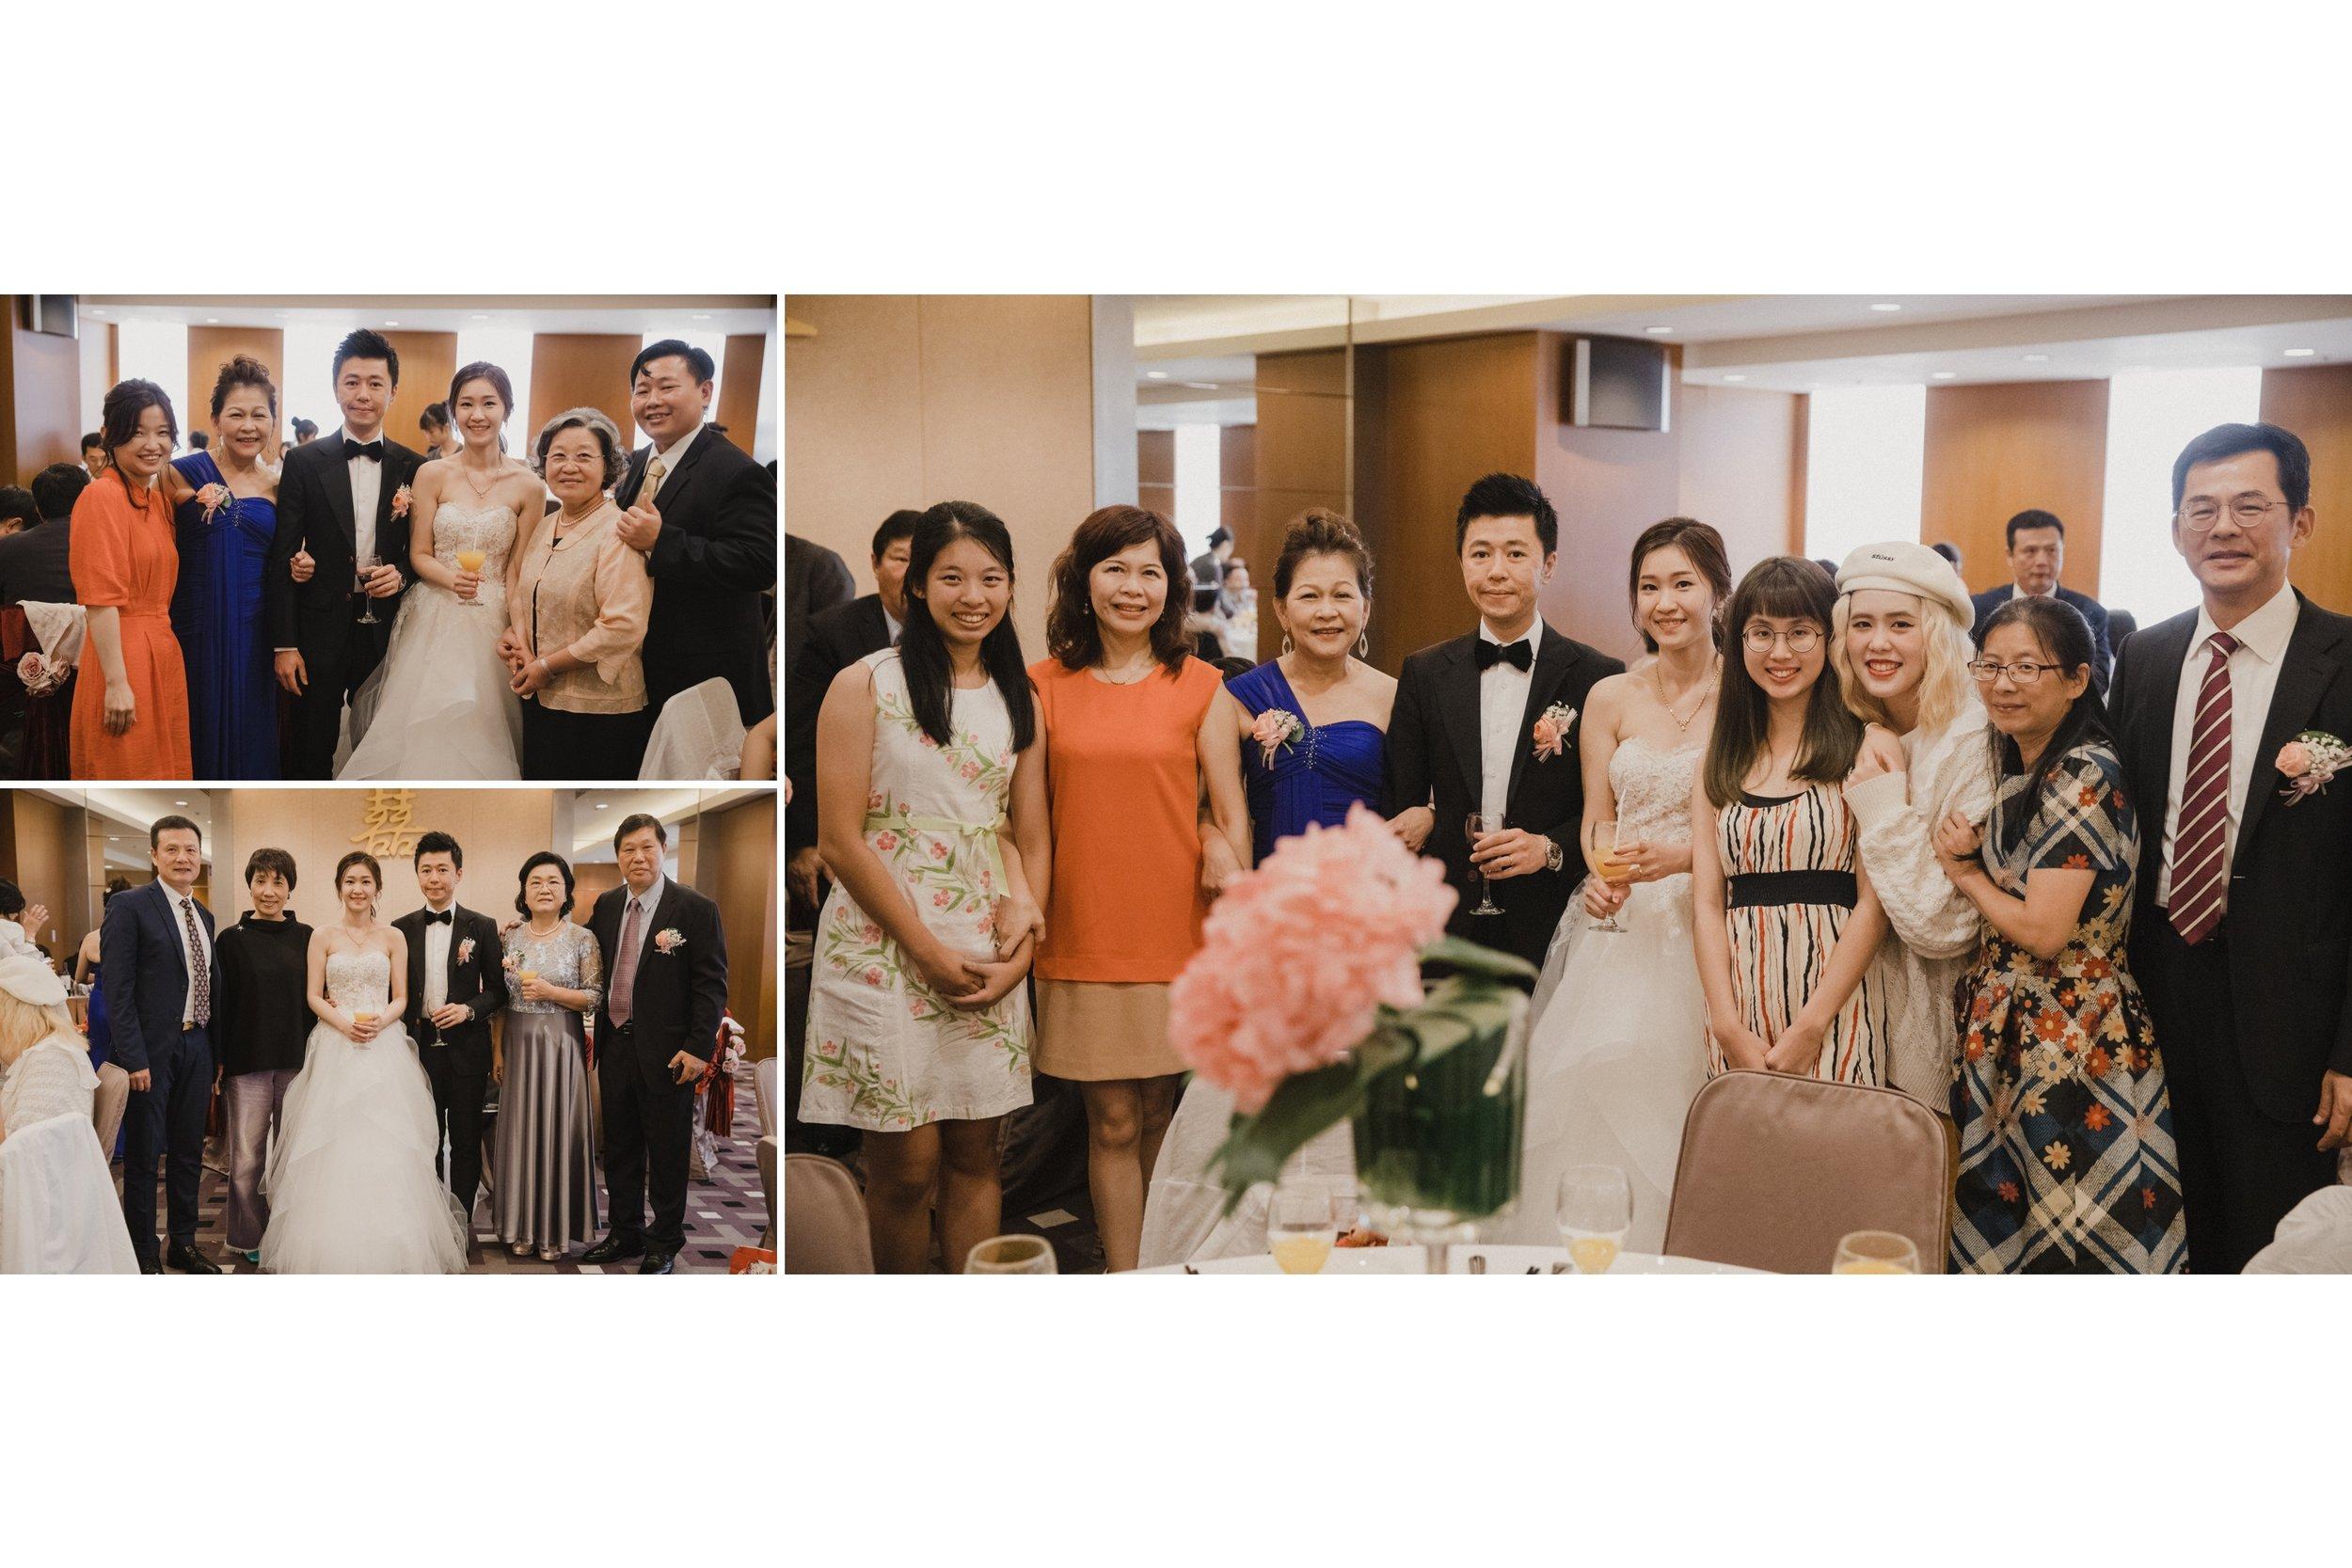 wedding-caridee-oscar-lunch-ambassador-hsinchu-結婚午宴-新竹國賓_142.jpg